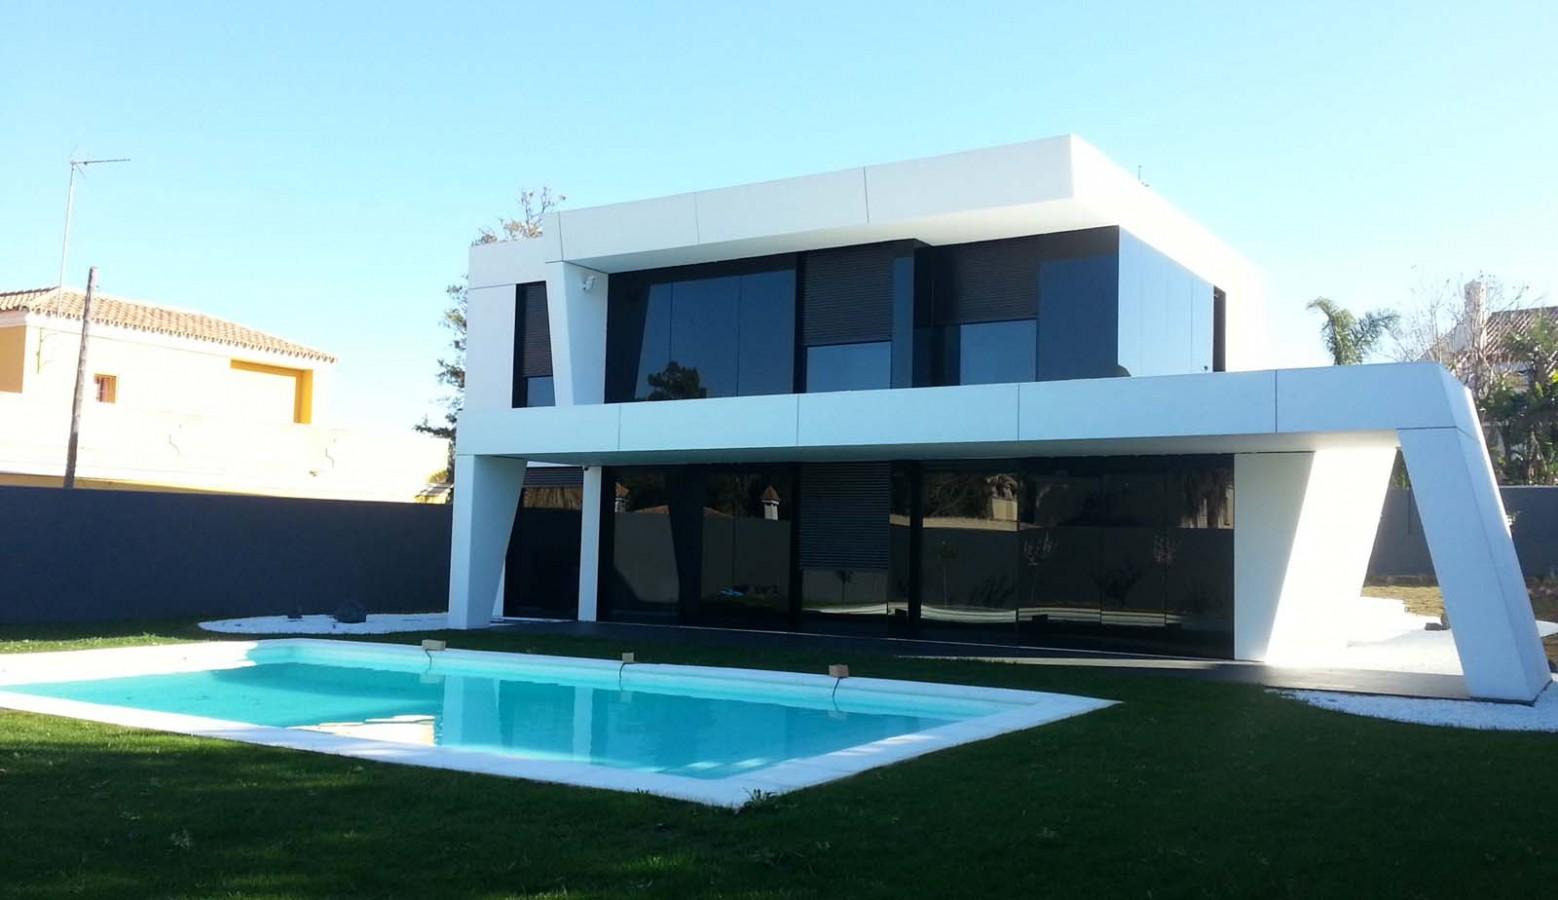 Casas prefabricadas a cero cubic evolution - Casas prefabricadas de diseno precios ...